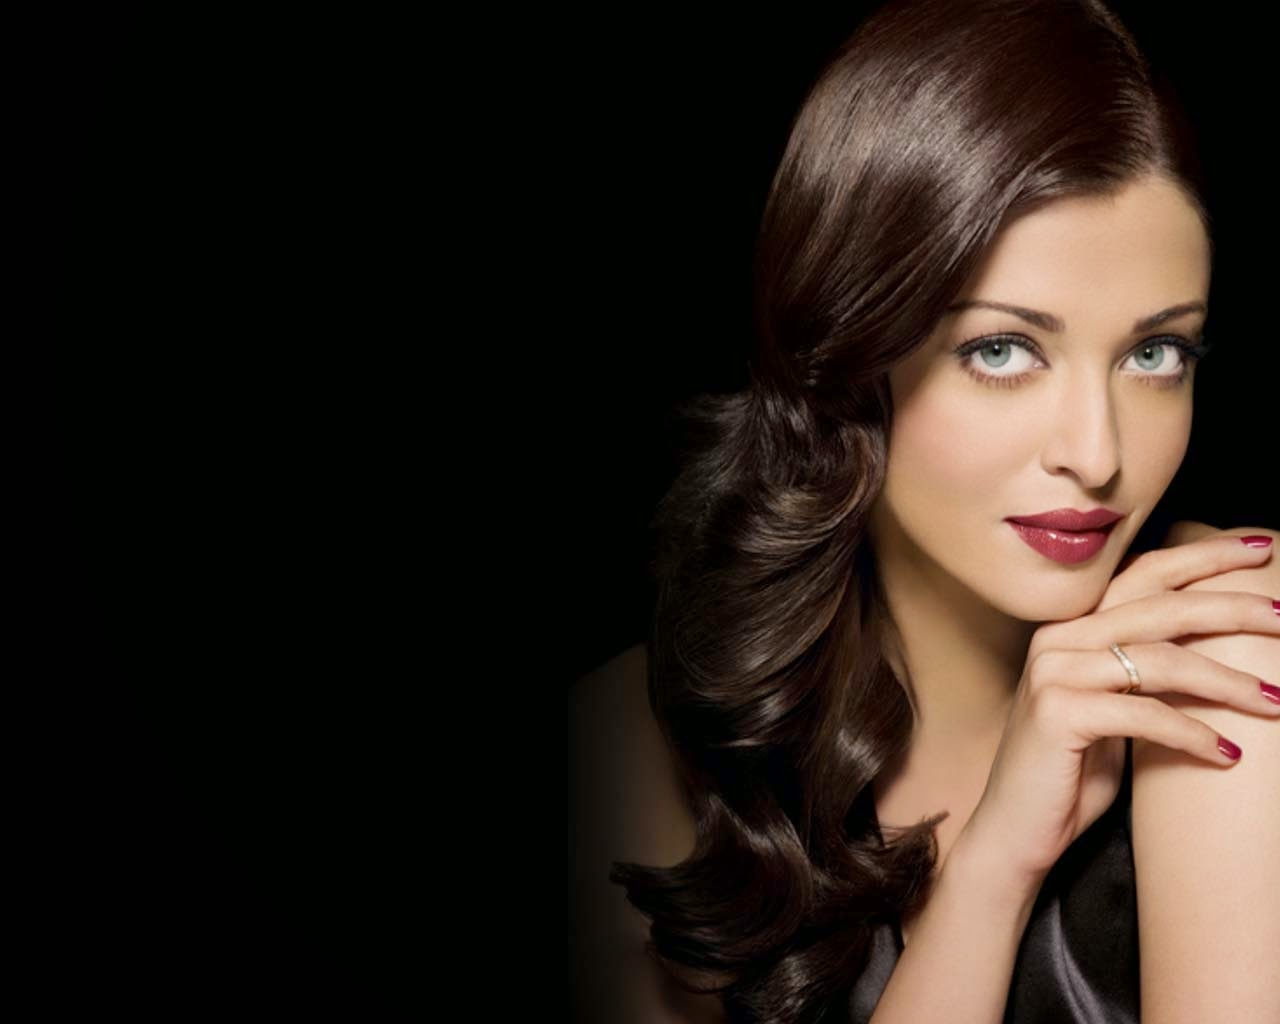 Aishwarya Rai Bachchan Hd Wallpapers: World Celebrities HD Wallpapers